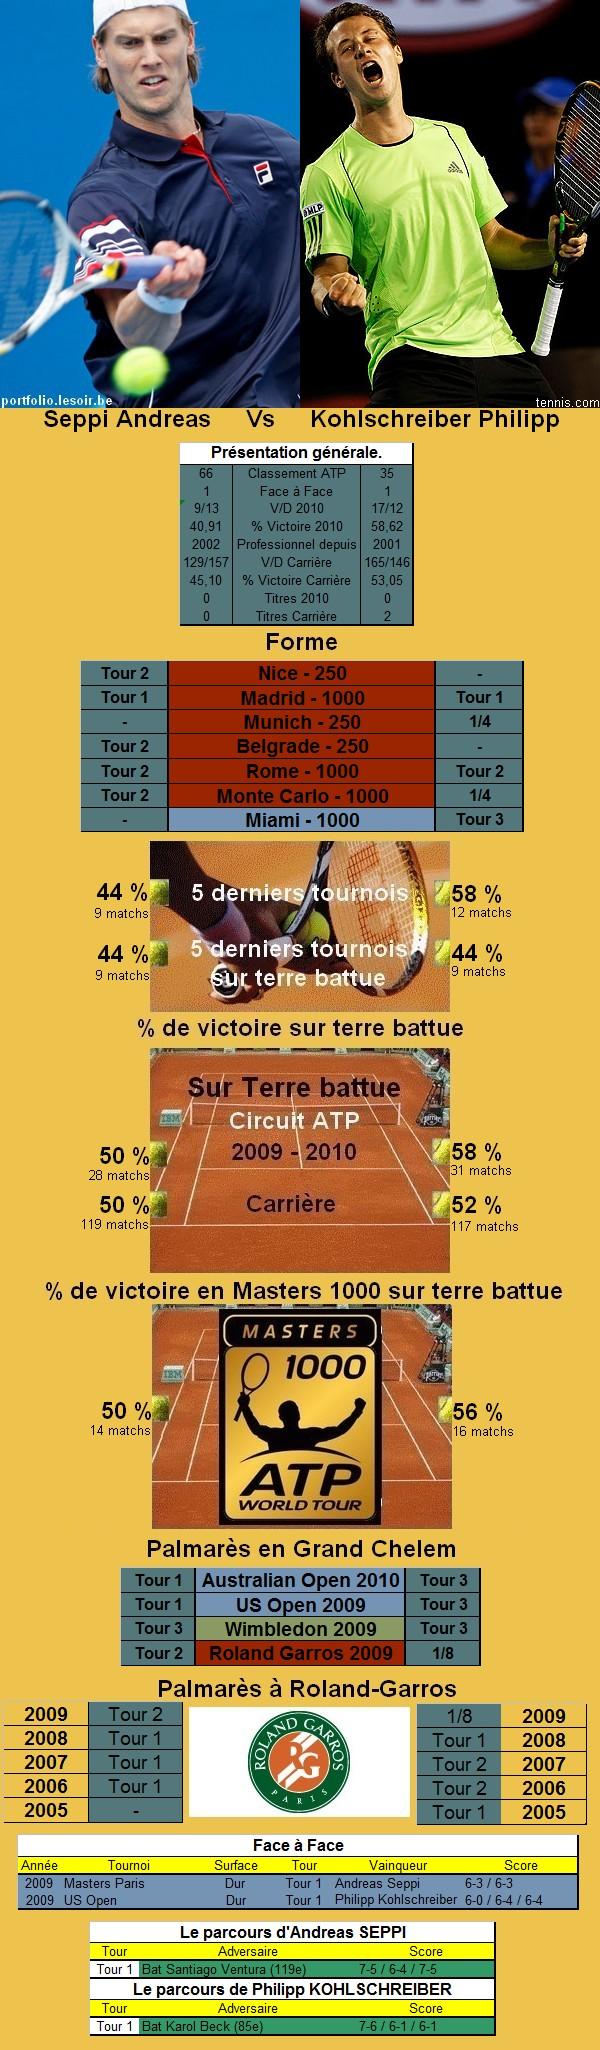 Statistiques tennis de Seppi contre Kohlschreiber à Roland Garros